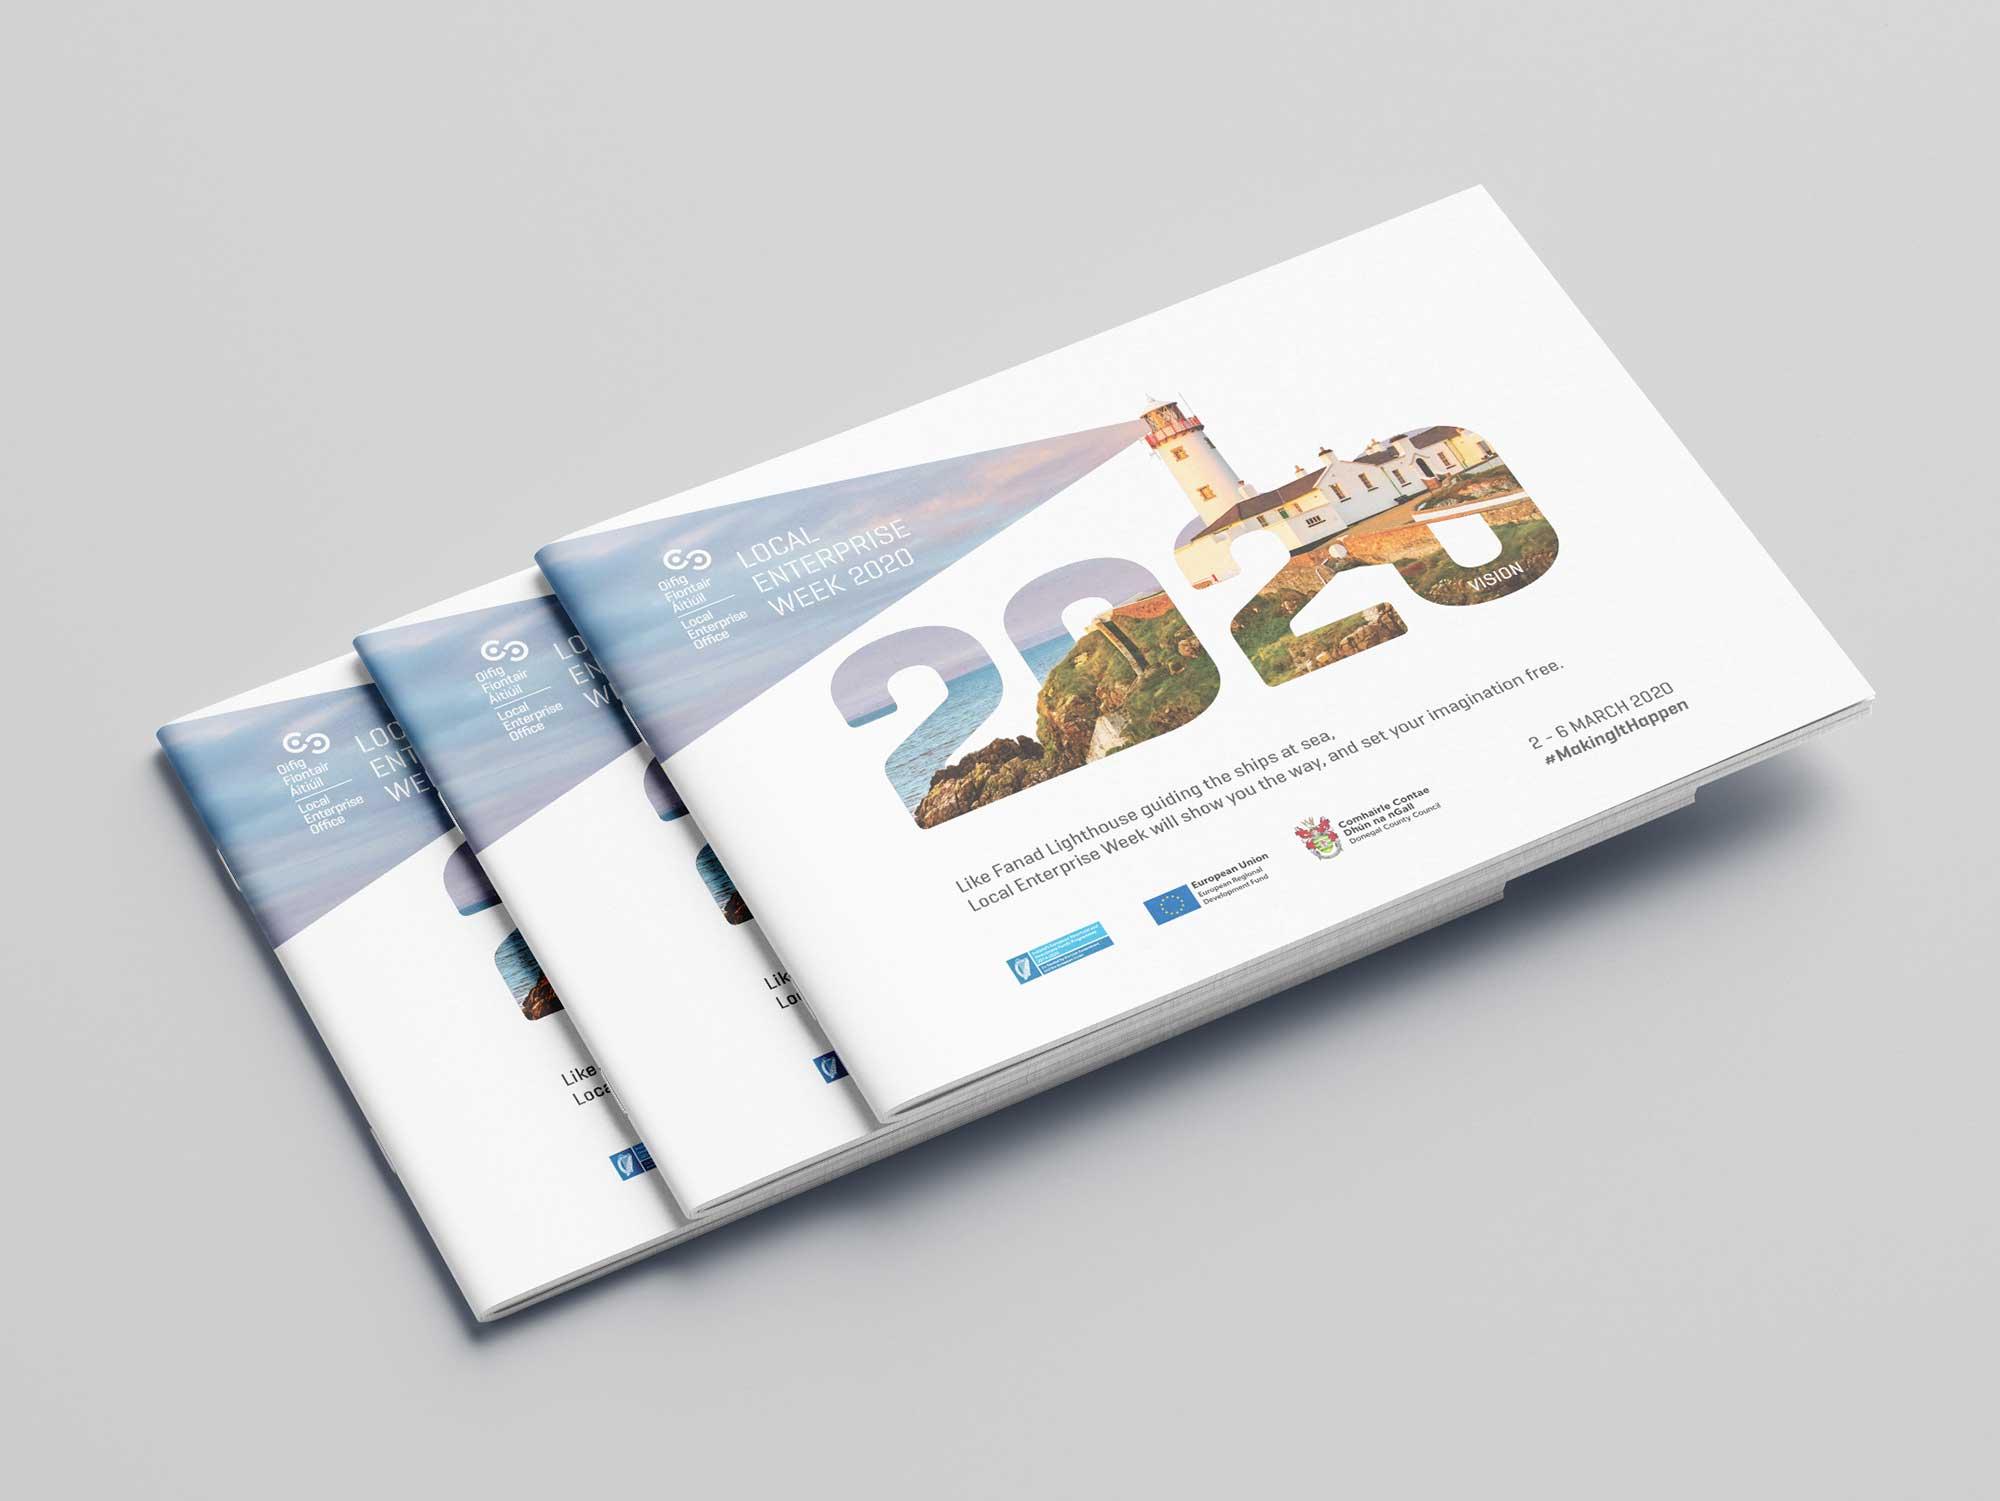 Donegal Local Enterprise Week 2020 Branding